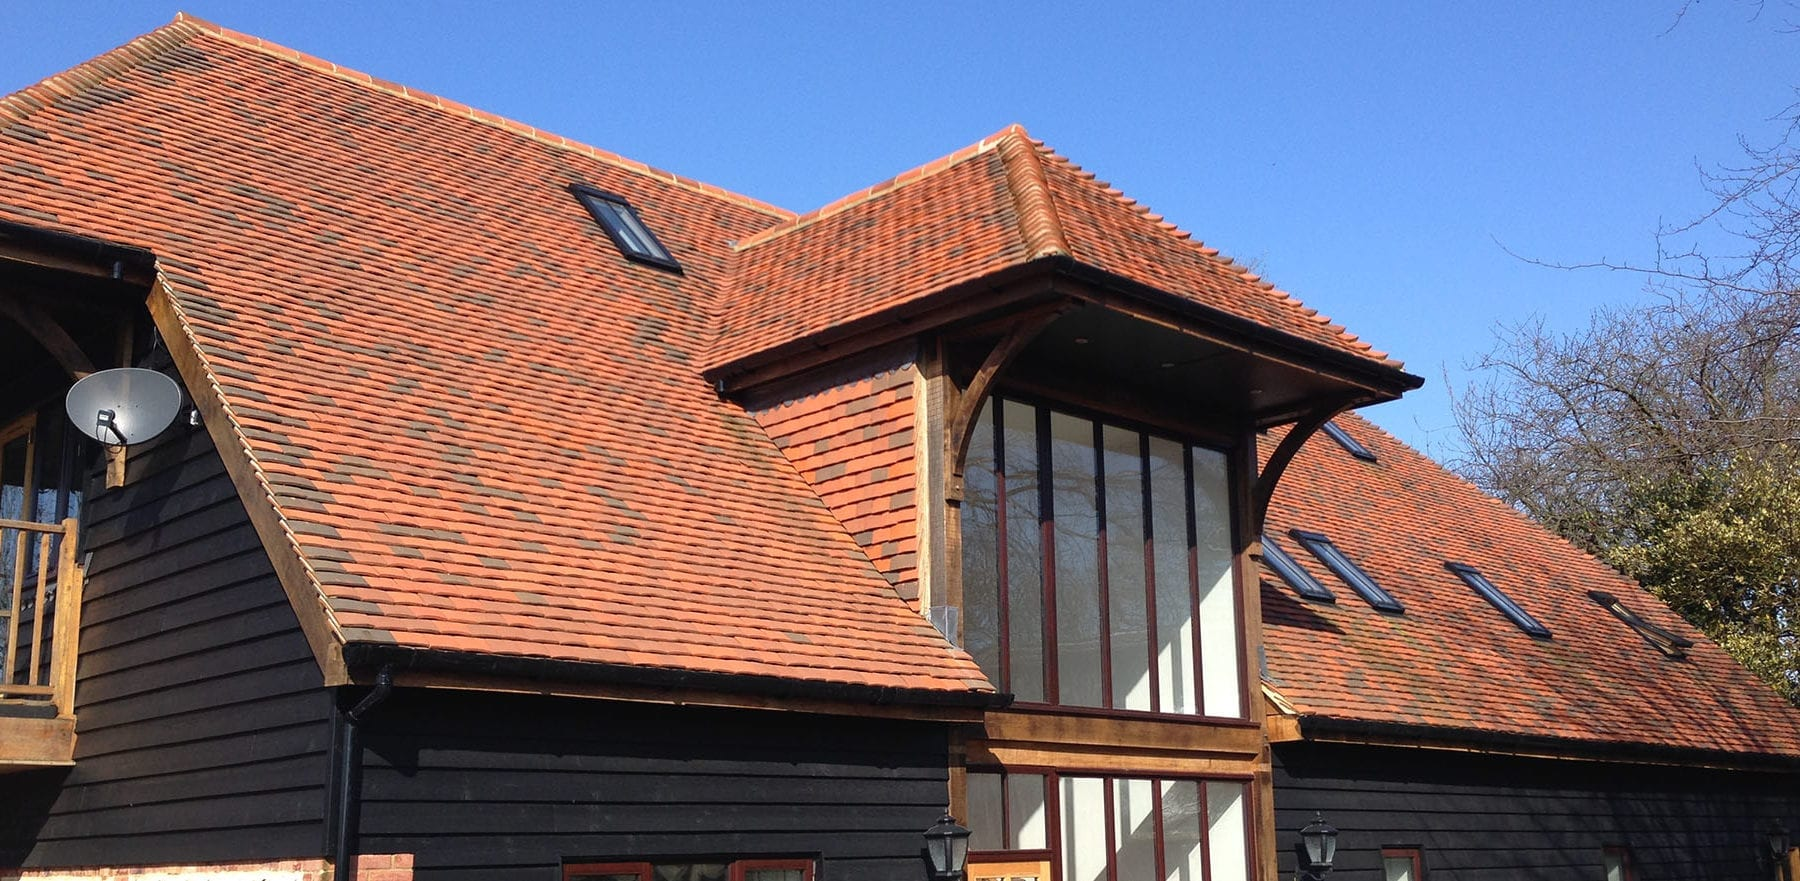 Lifestiles - Handcrafted Tilehurst Clay Roof Tiles - Folkstone, England 2